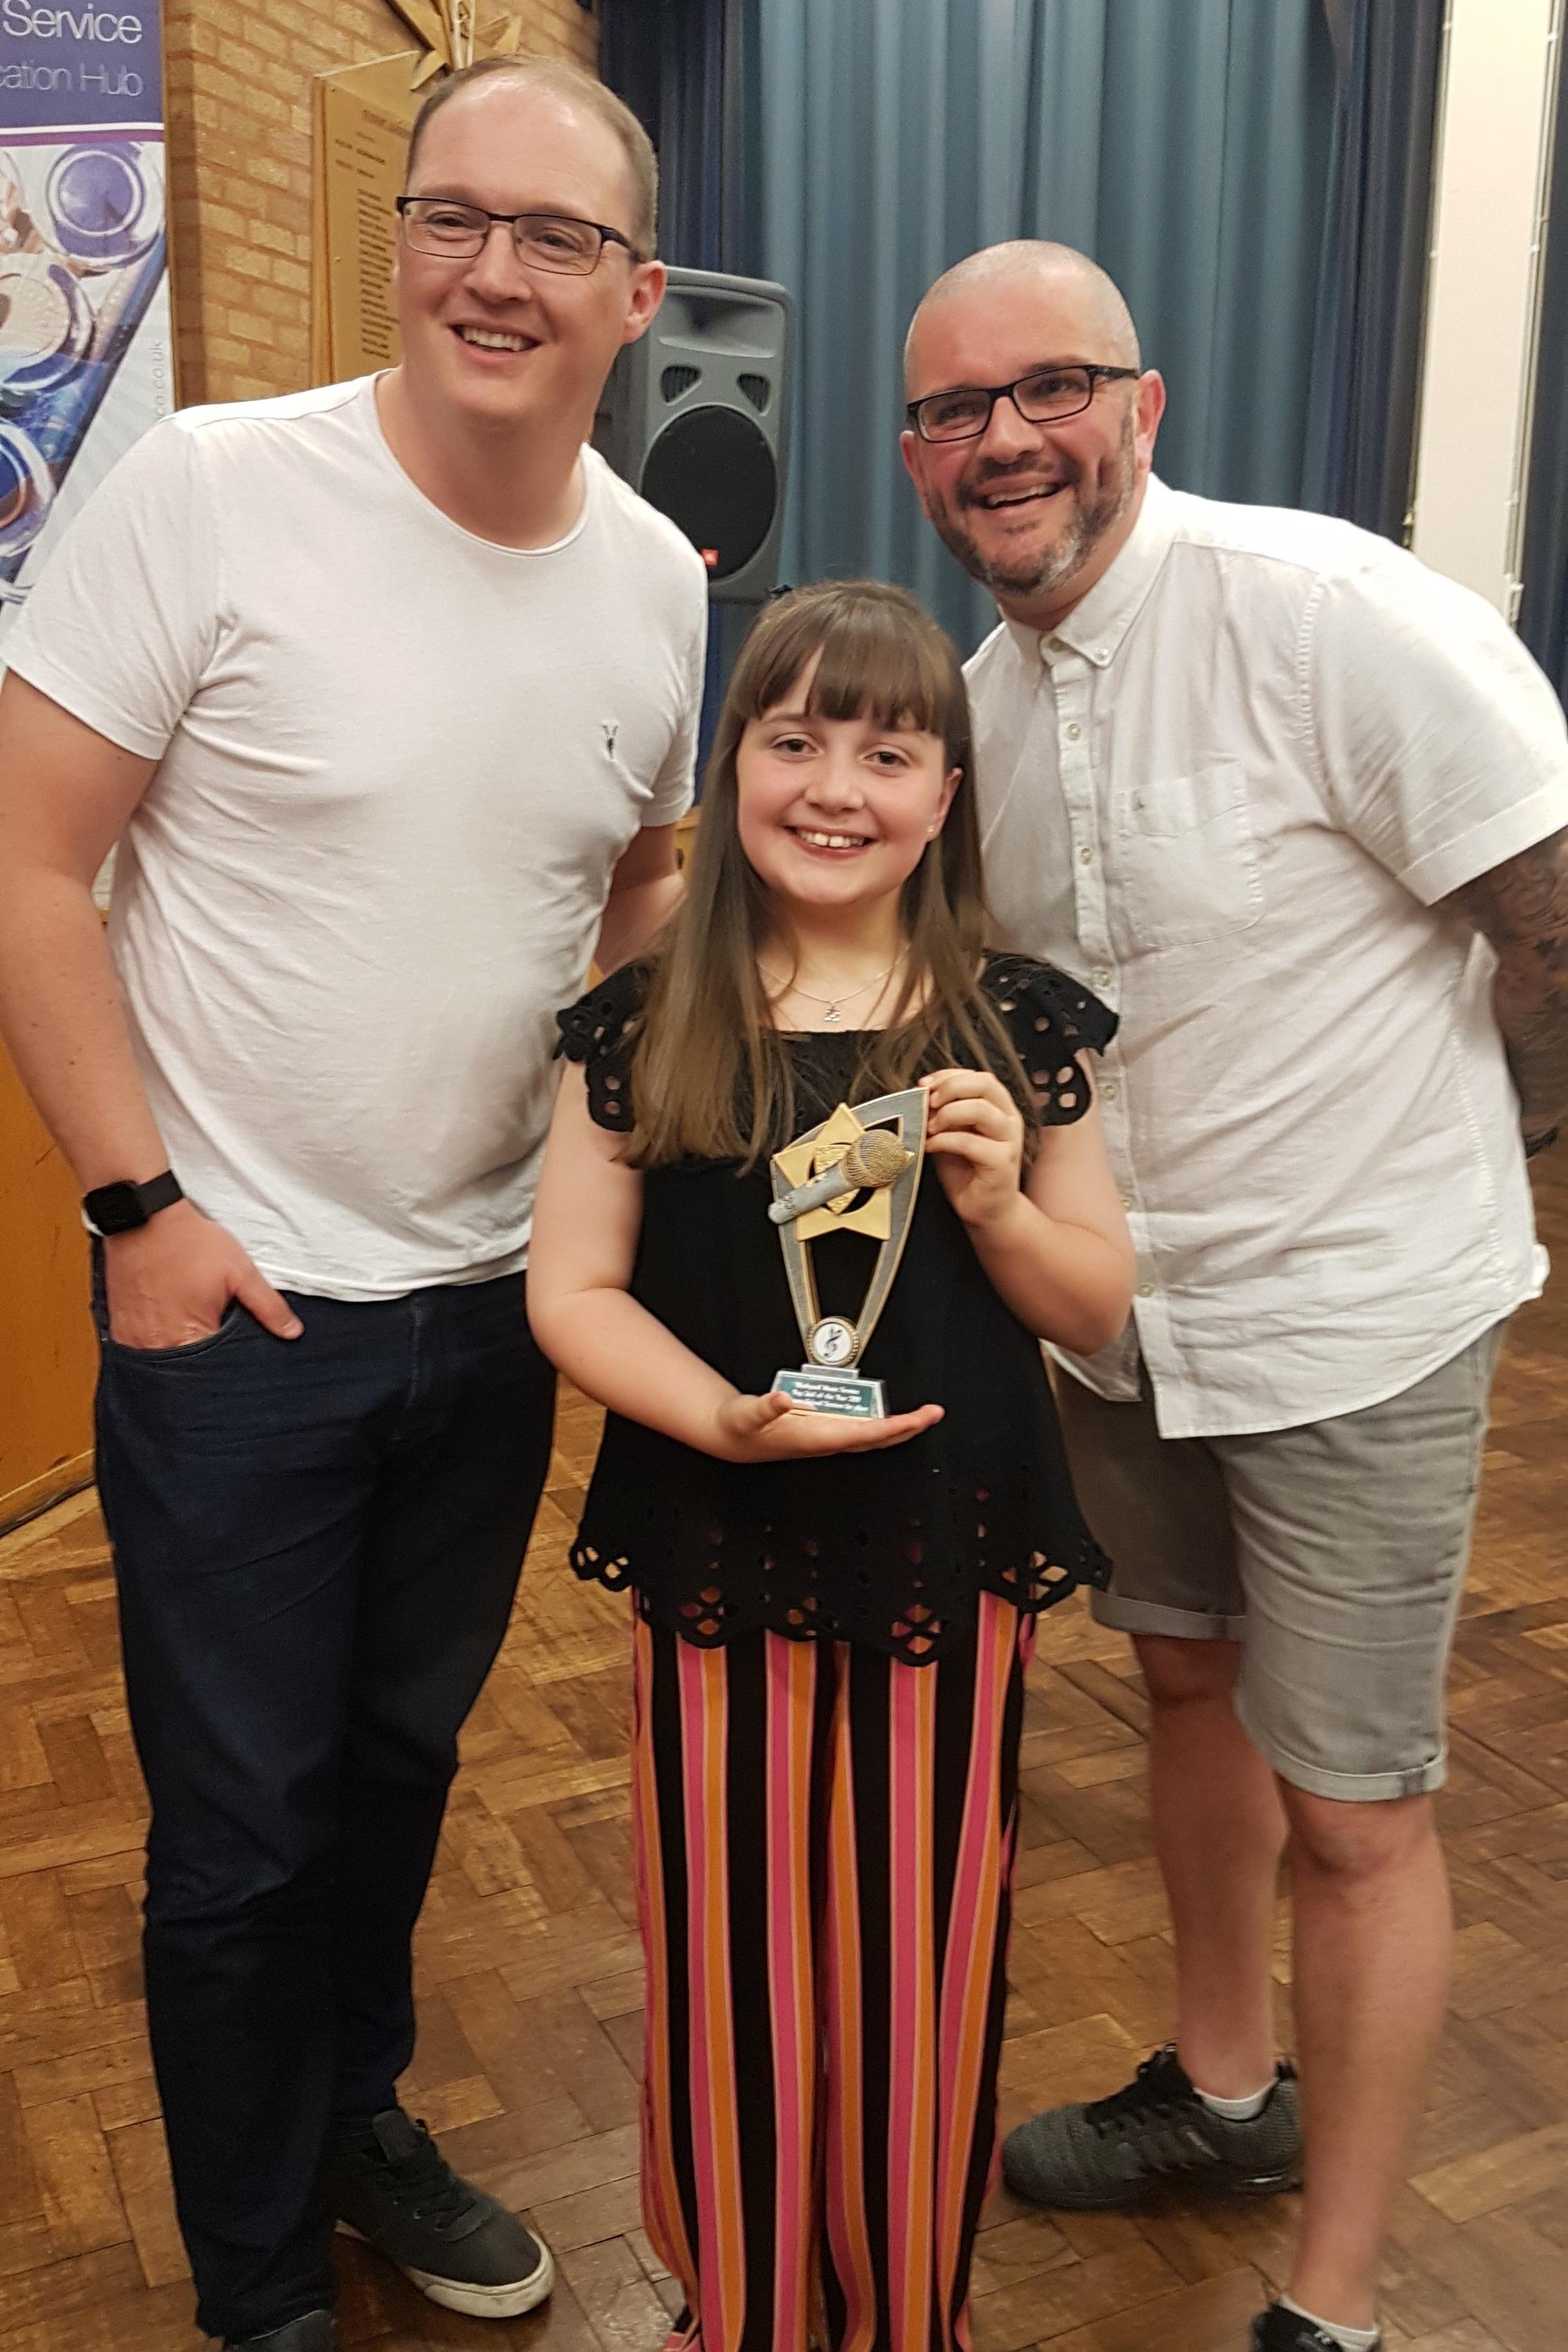 KS2 Pop Idol Winner 2019 with judges Ged Mills and Scott Gallagher